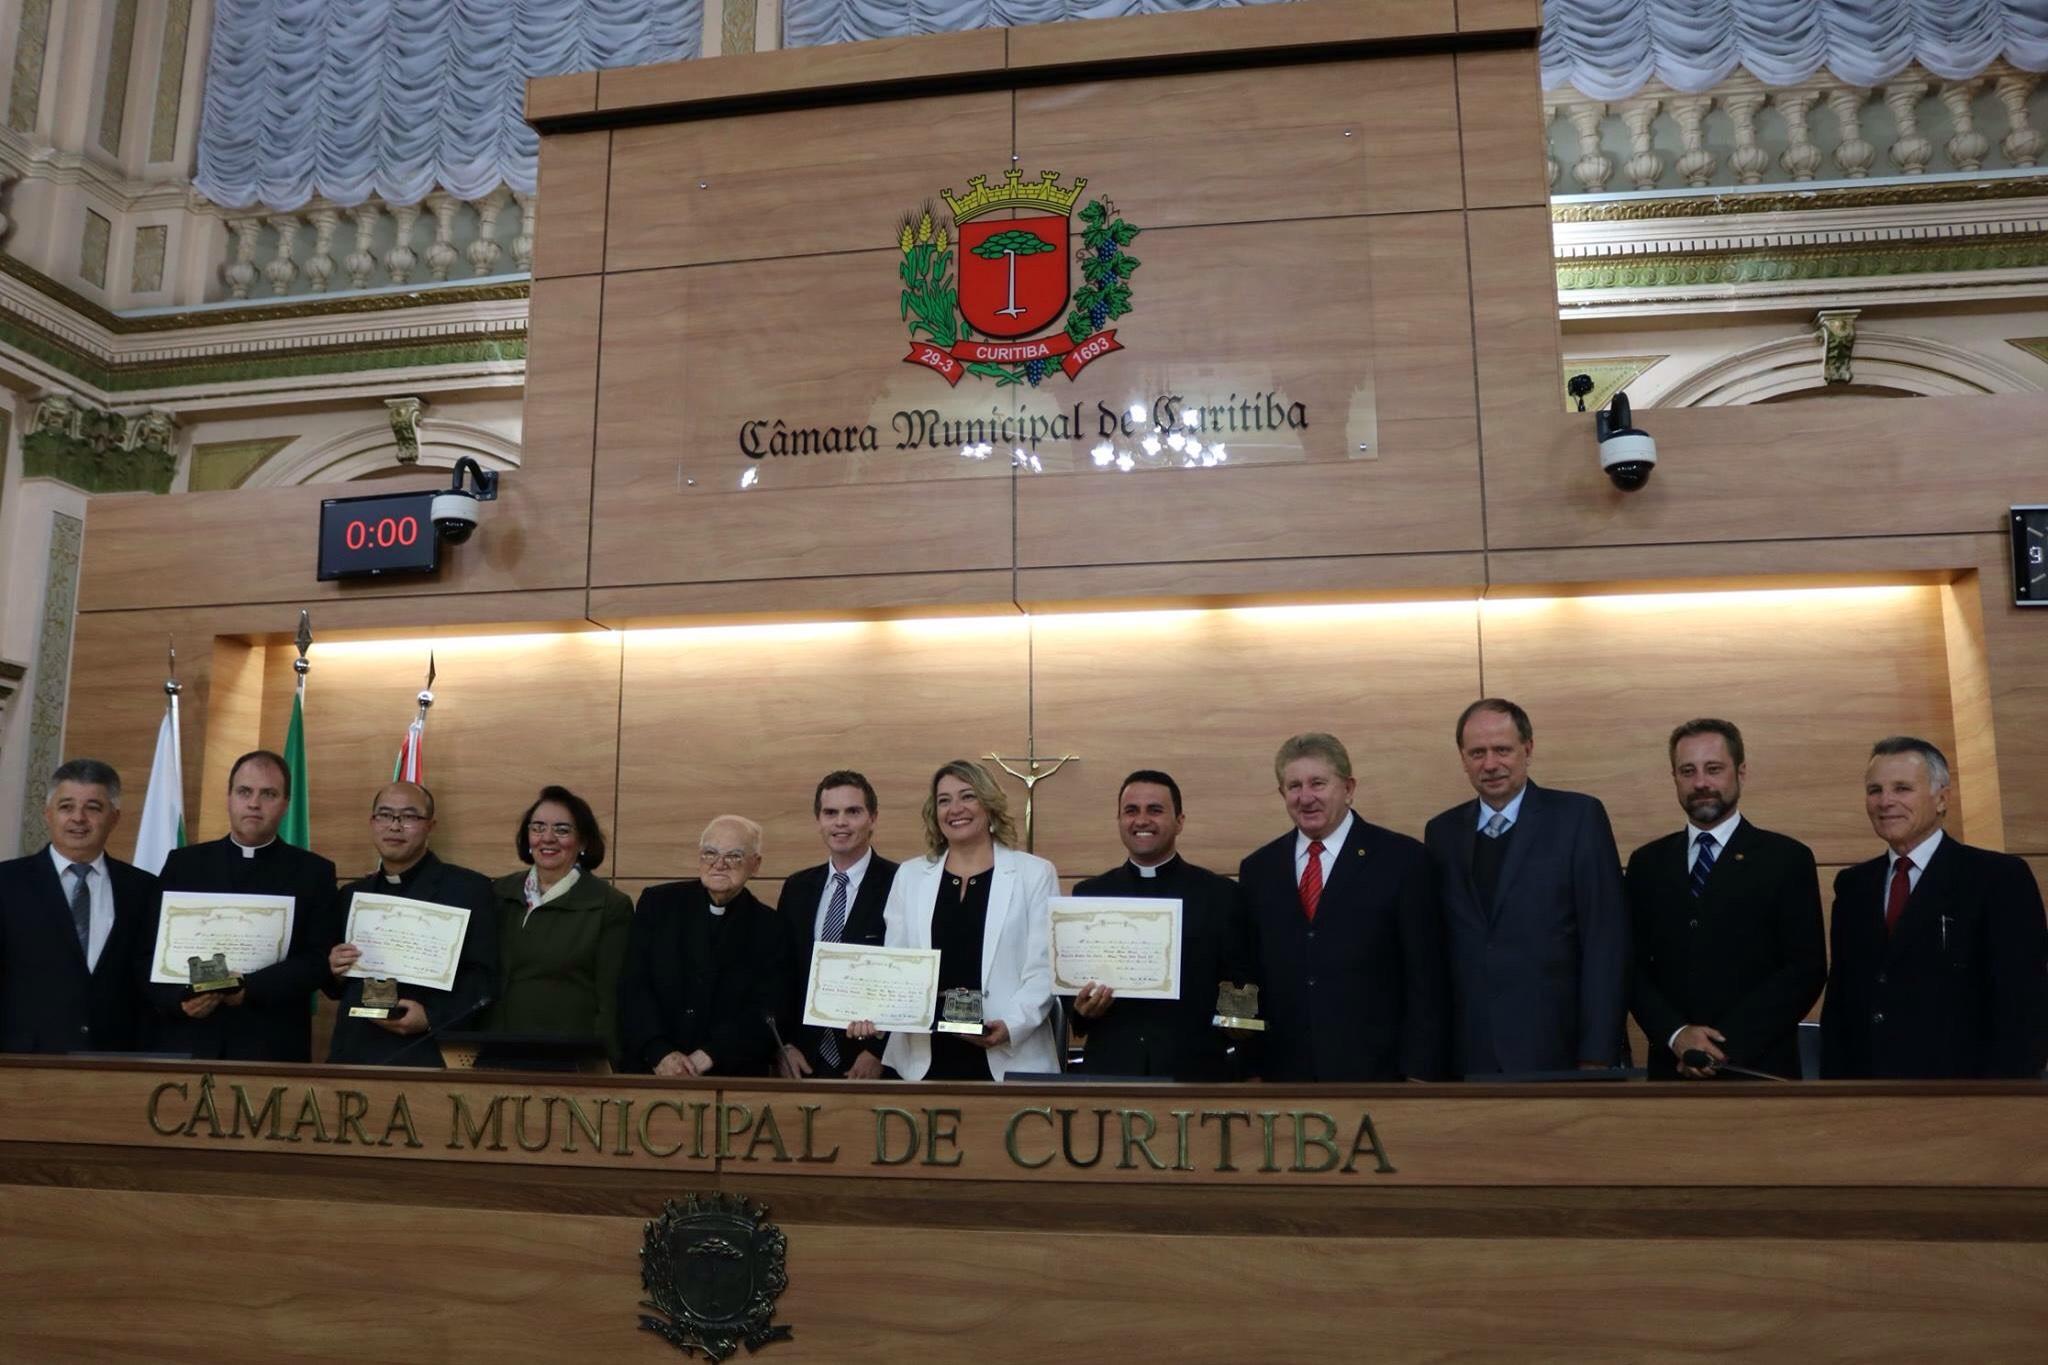 (Prêmio João Paulo II - Foto: site do vereador Tito Zeglin)